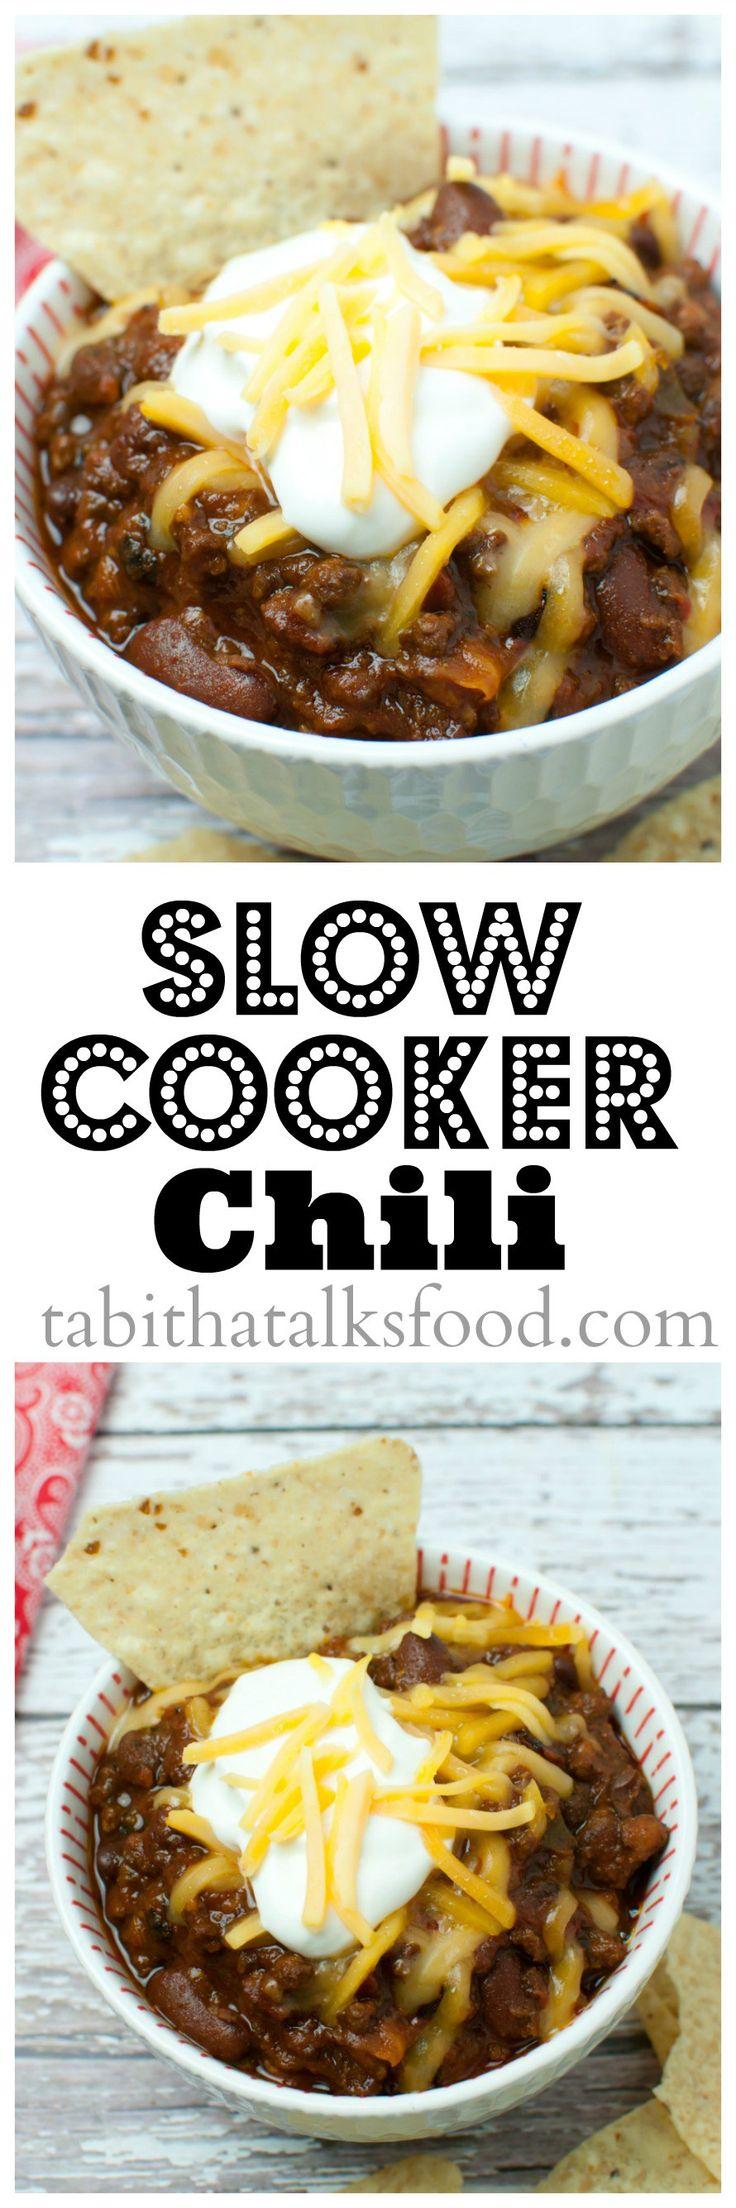 Slow Cooker Chili - Tabitha Talks Food